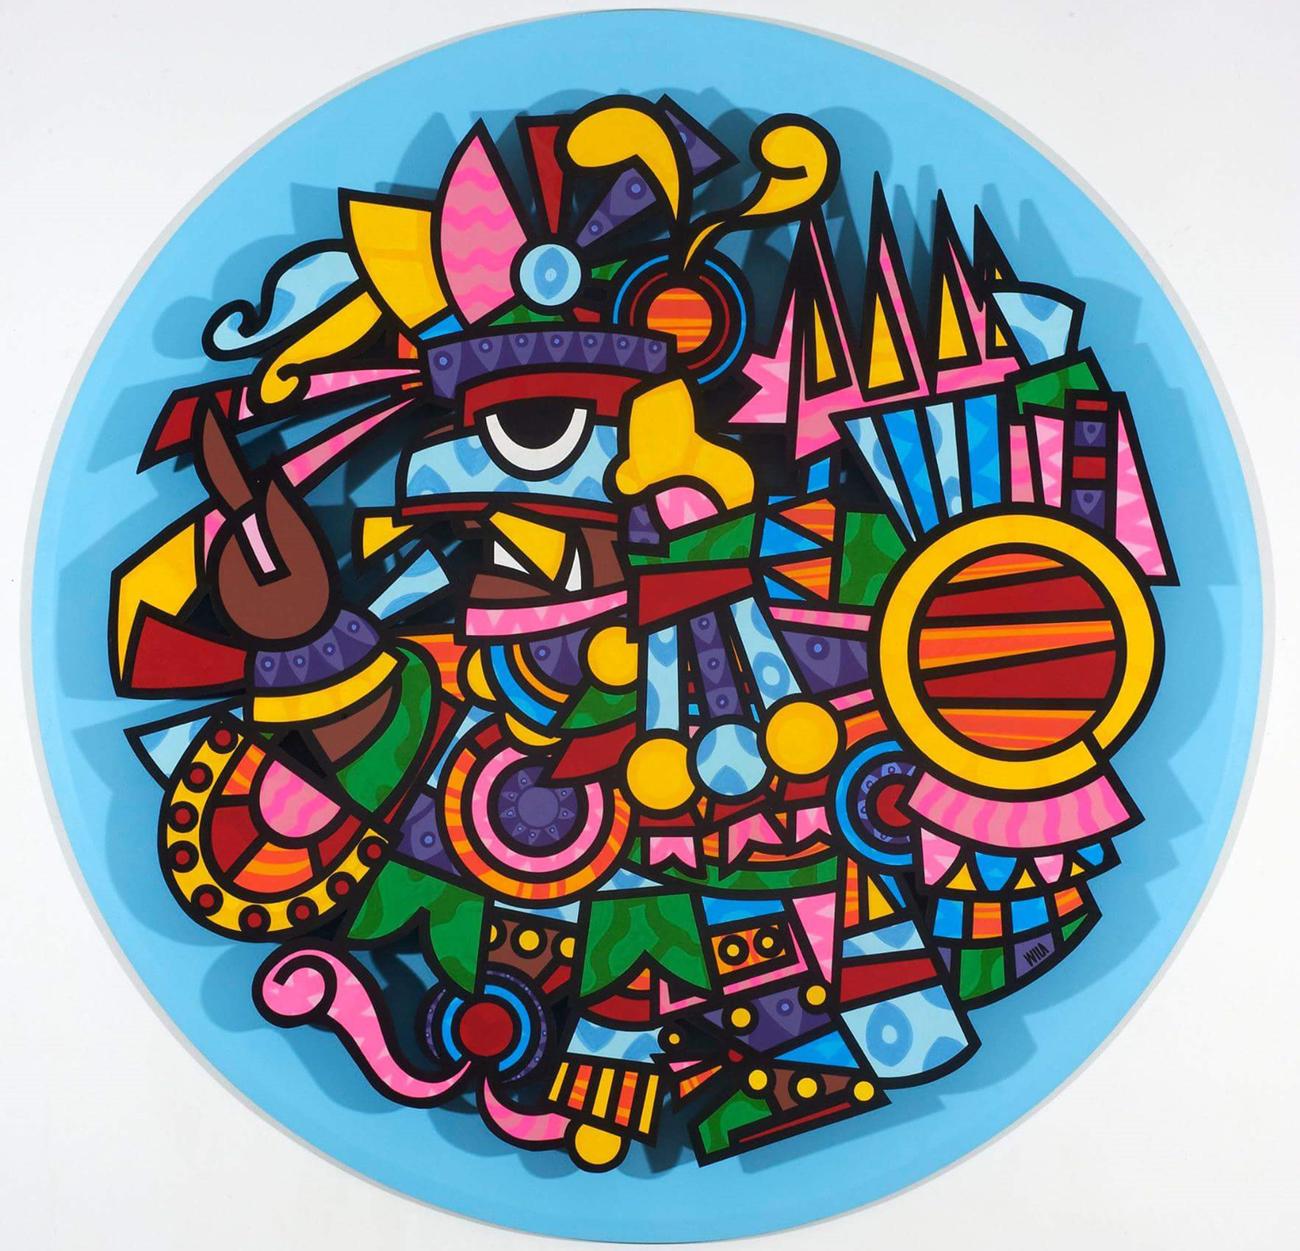 Fernando Davila - America Perdida cercle bleu